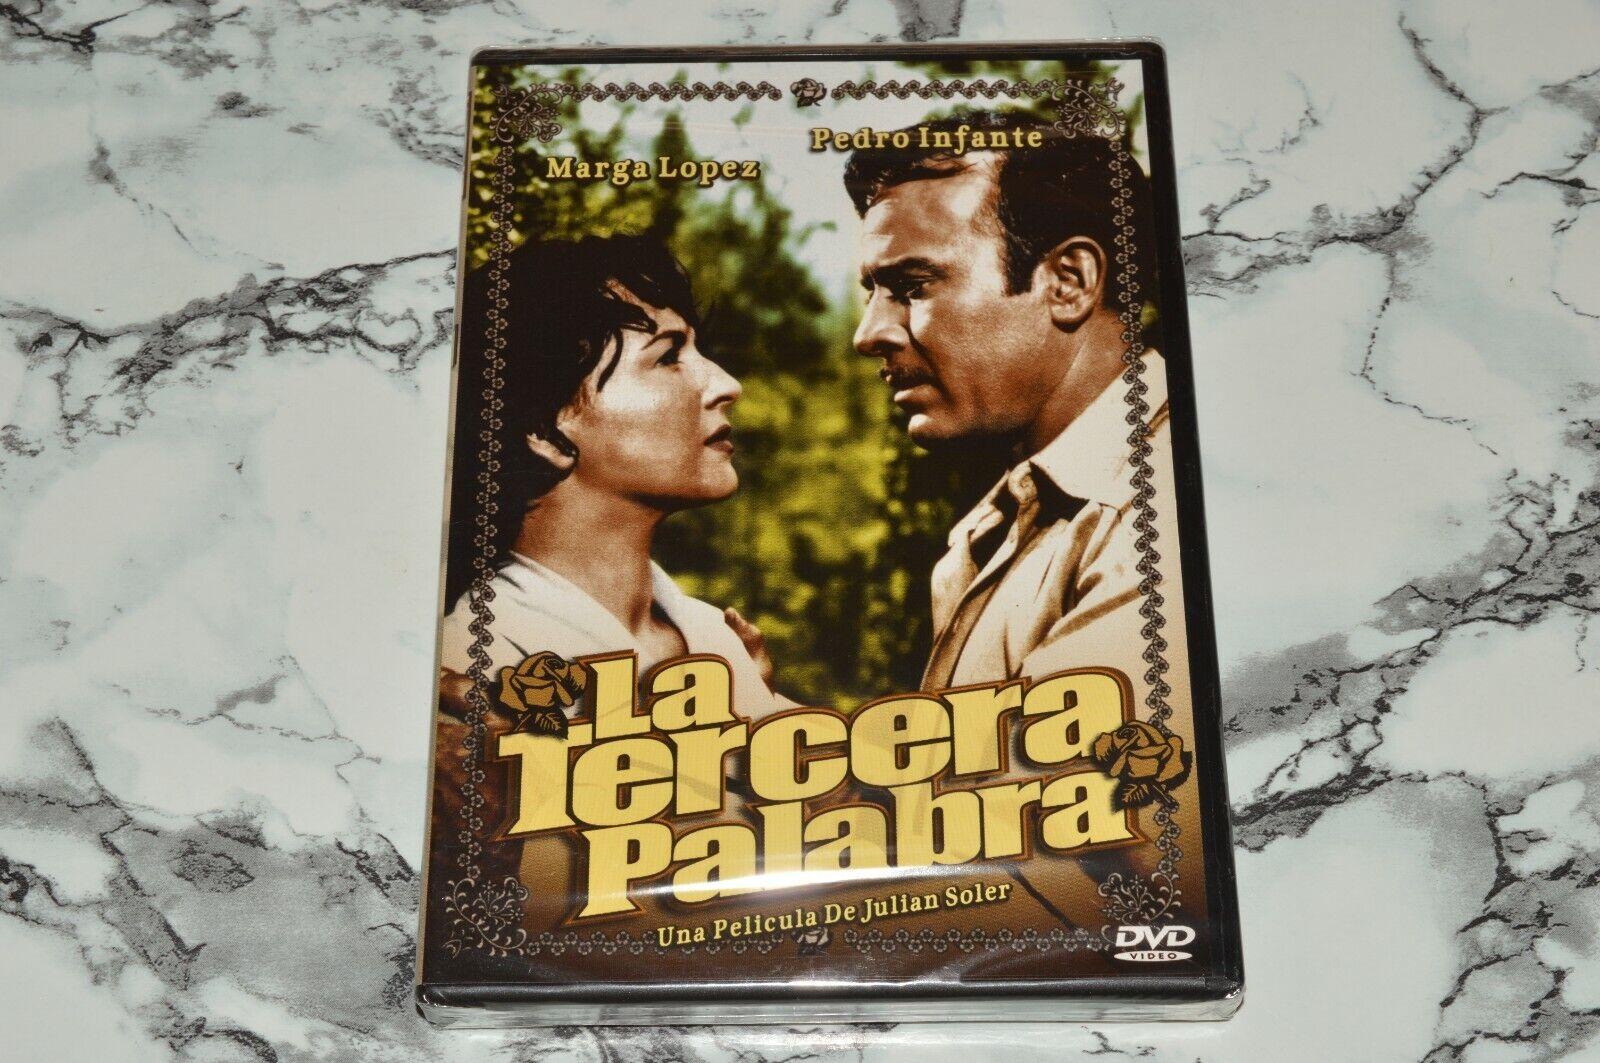 NEW - La Tercera Palabra DVD, 2002 -- Pedro Infante Marga Lopez - $12.68